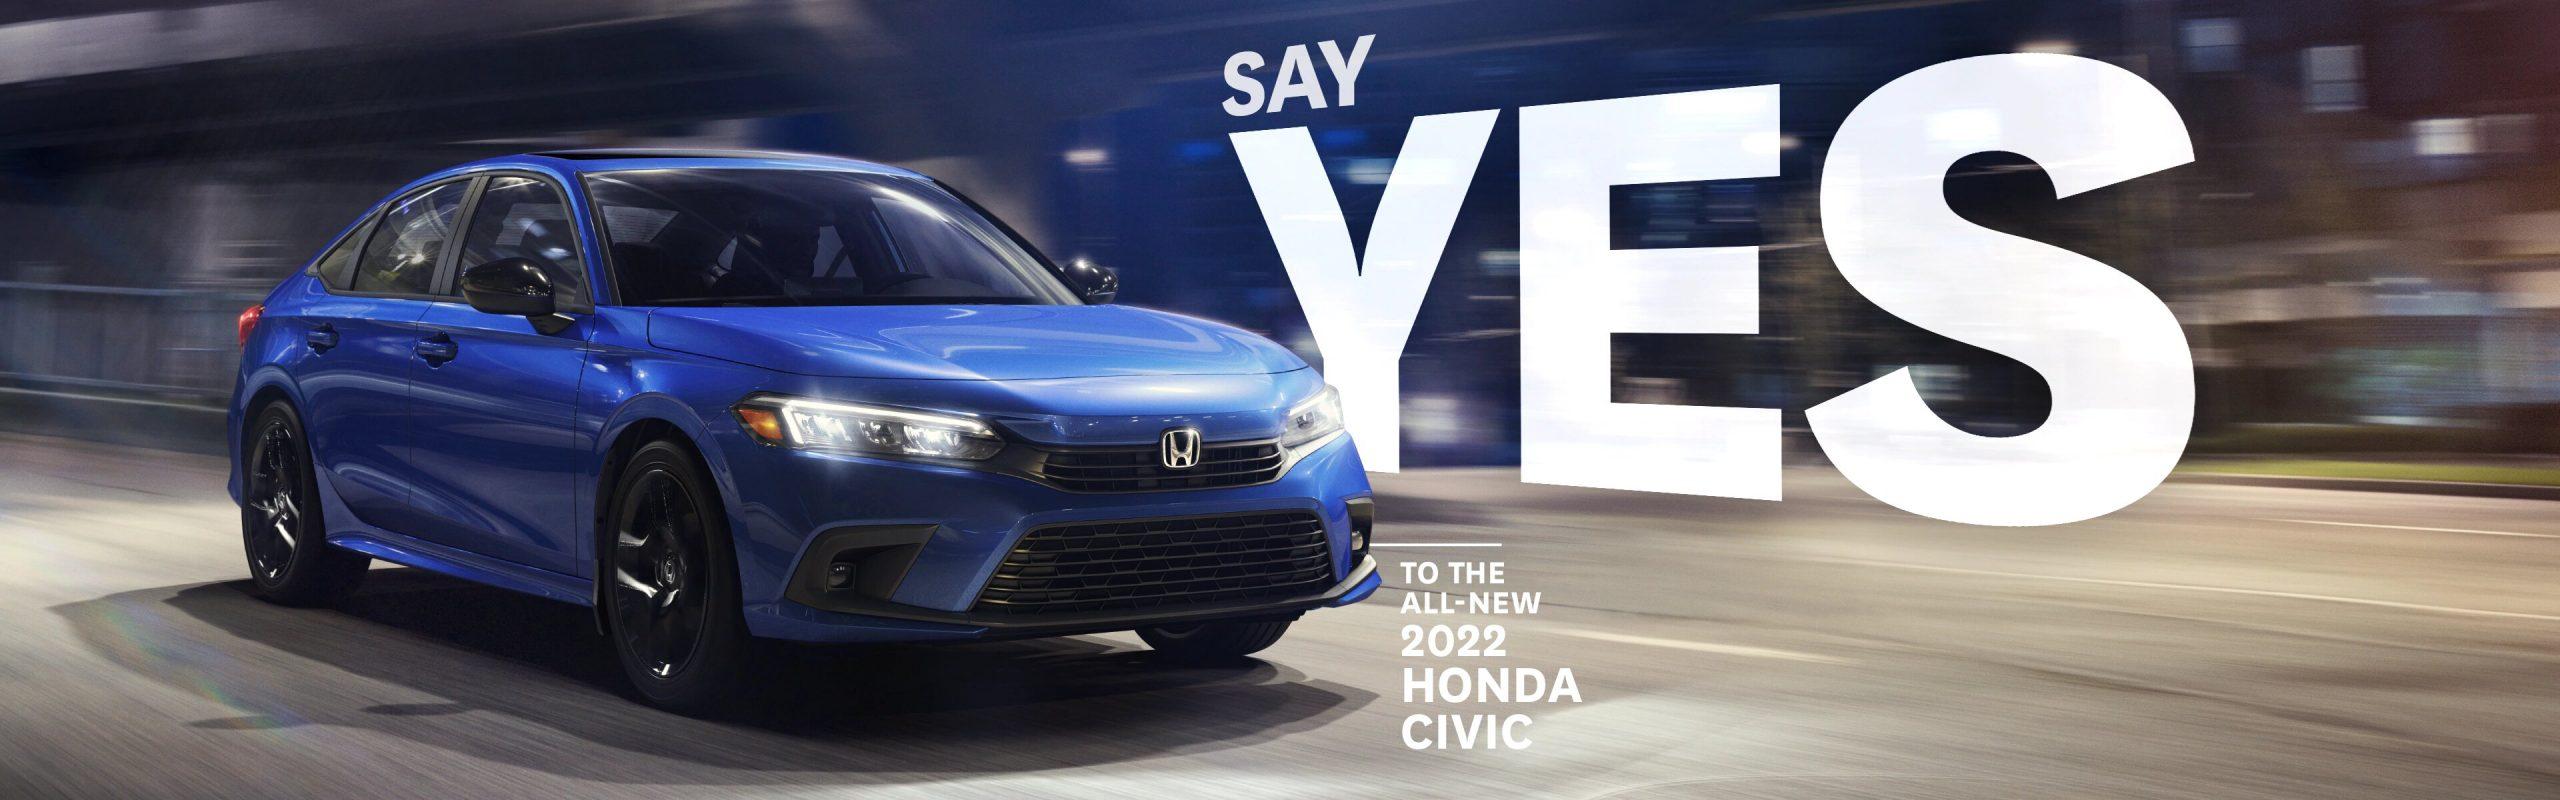 New 2022 Honda Civic